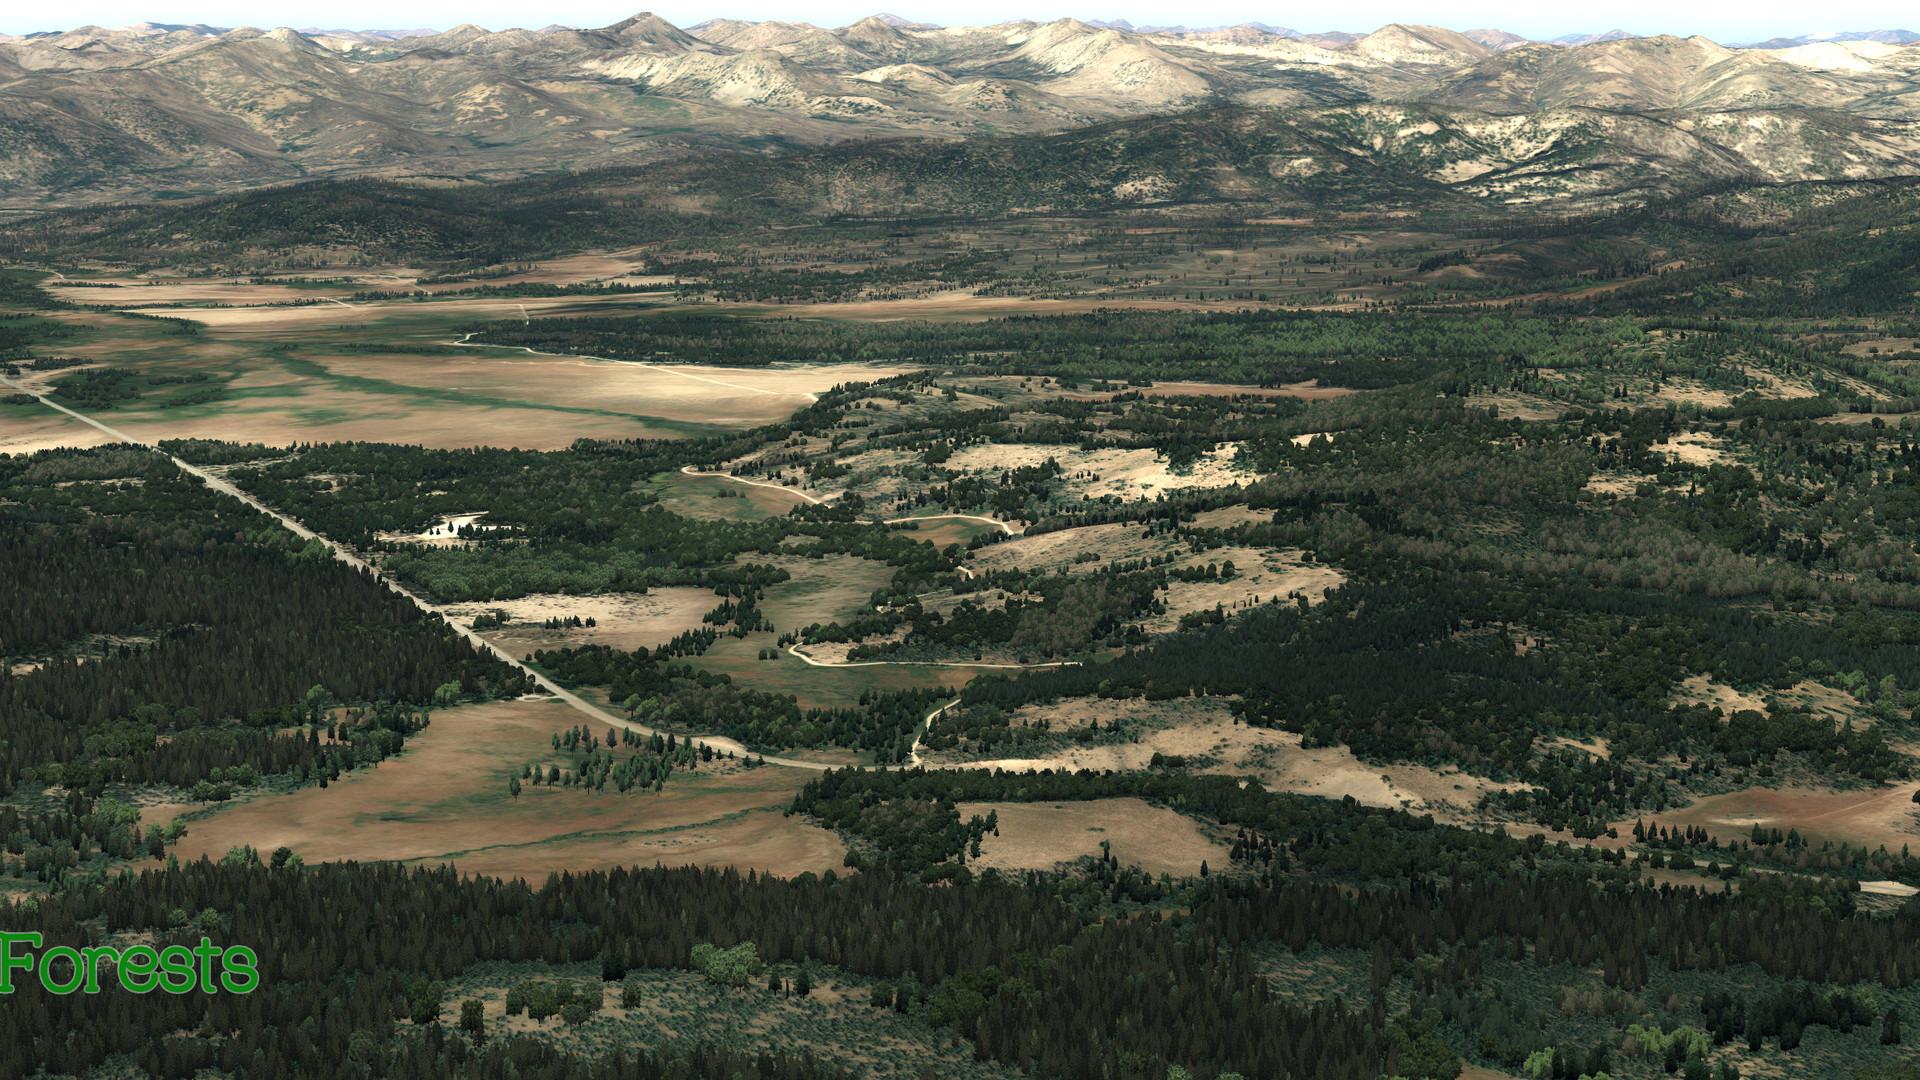 Global_Forests_USA2.jpg